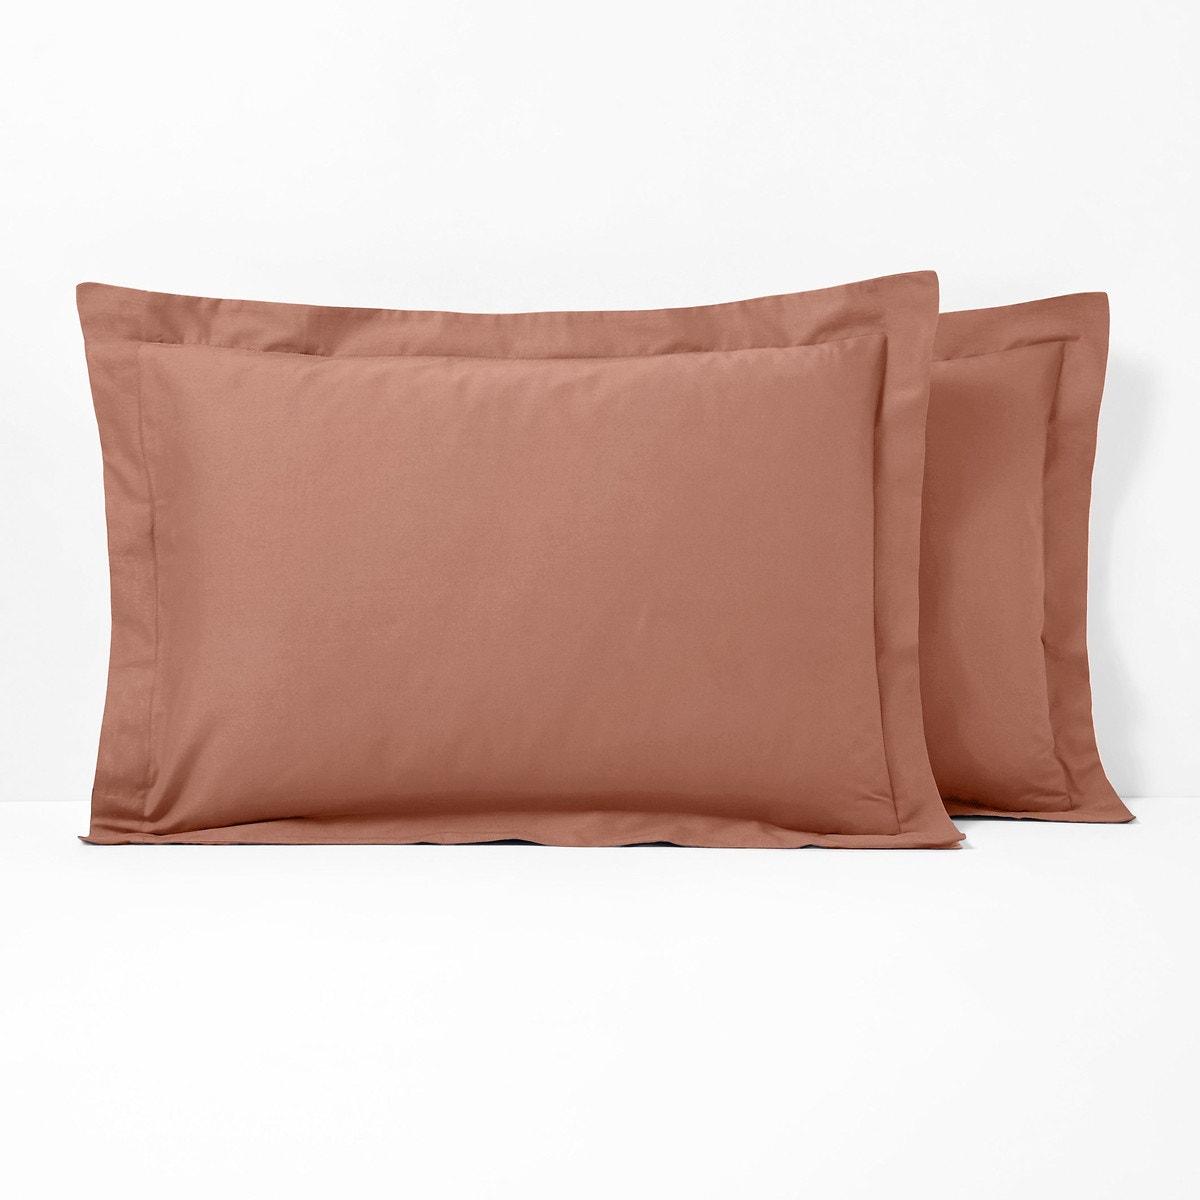 Scenario コットン枕カバー